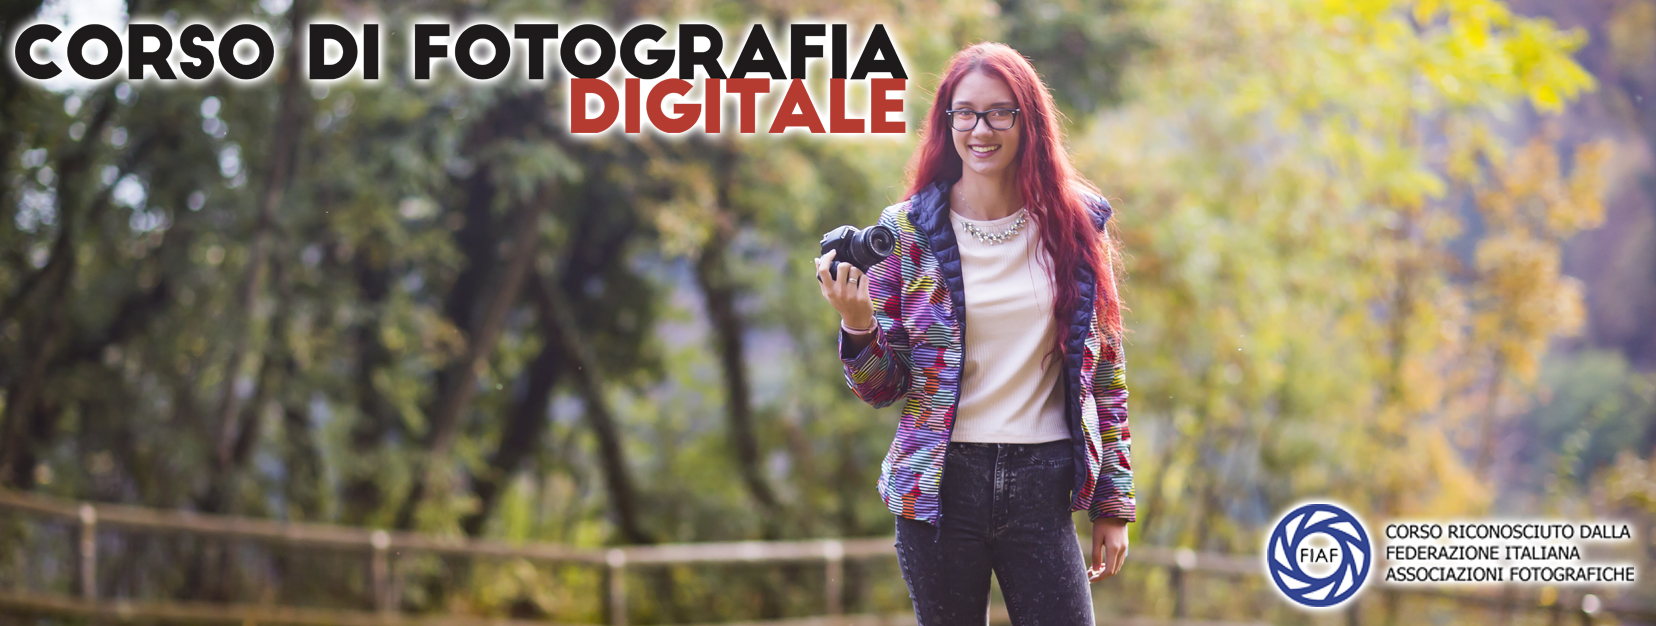 corsodifotografia2017_copertina